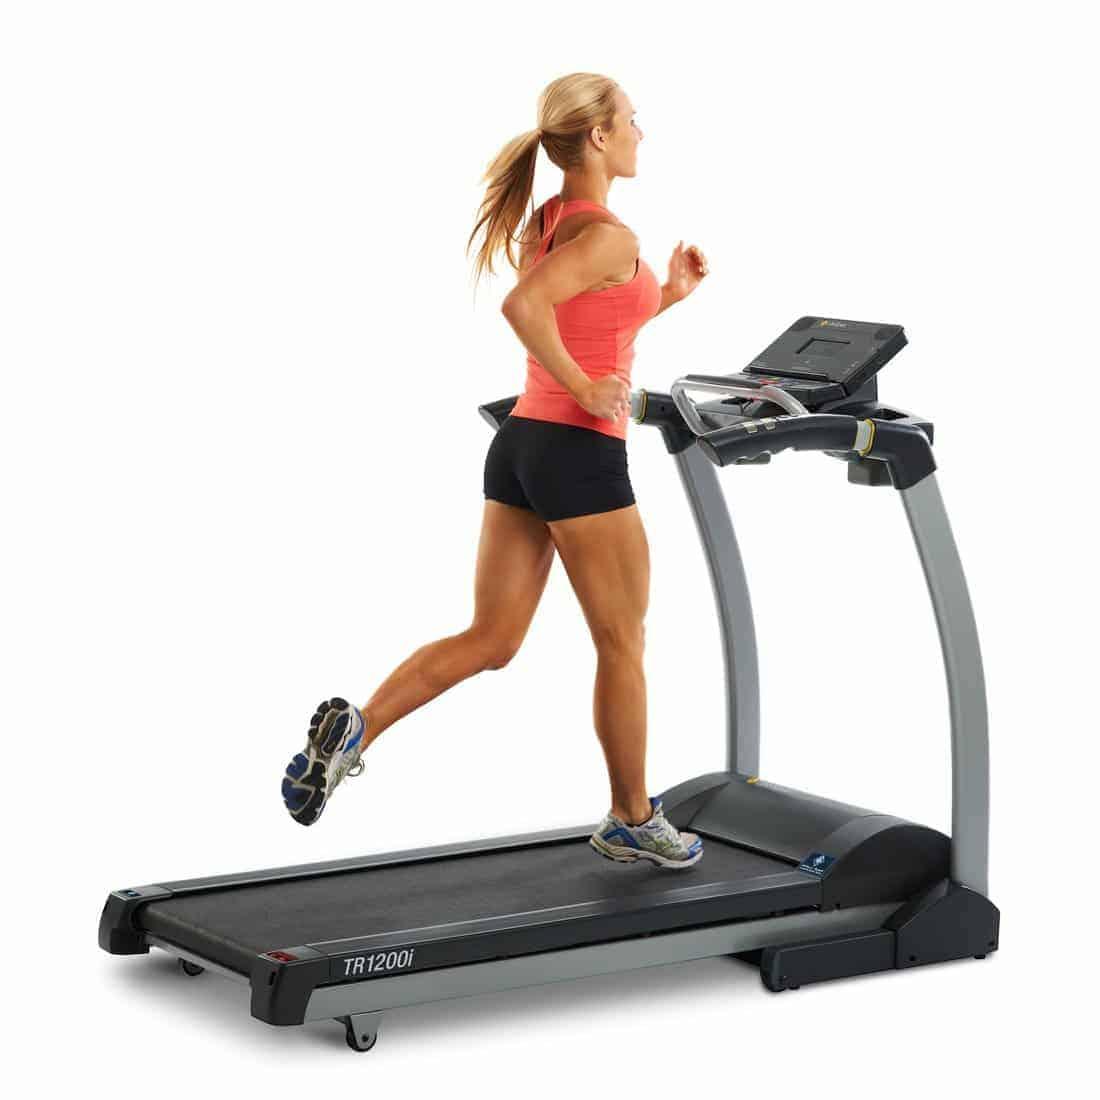 Best Treadmill For Big Guys – Heavy Duty Treadmills 2020